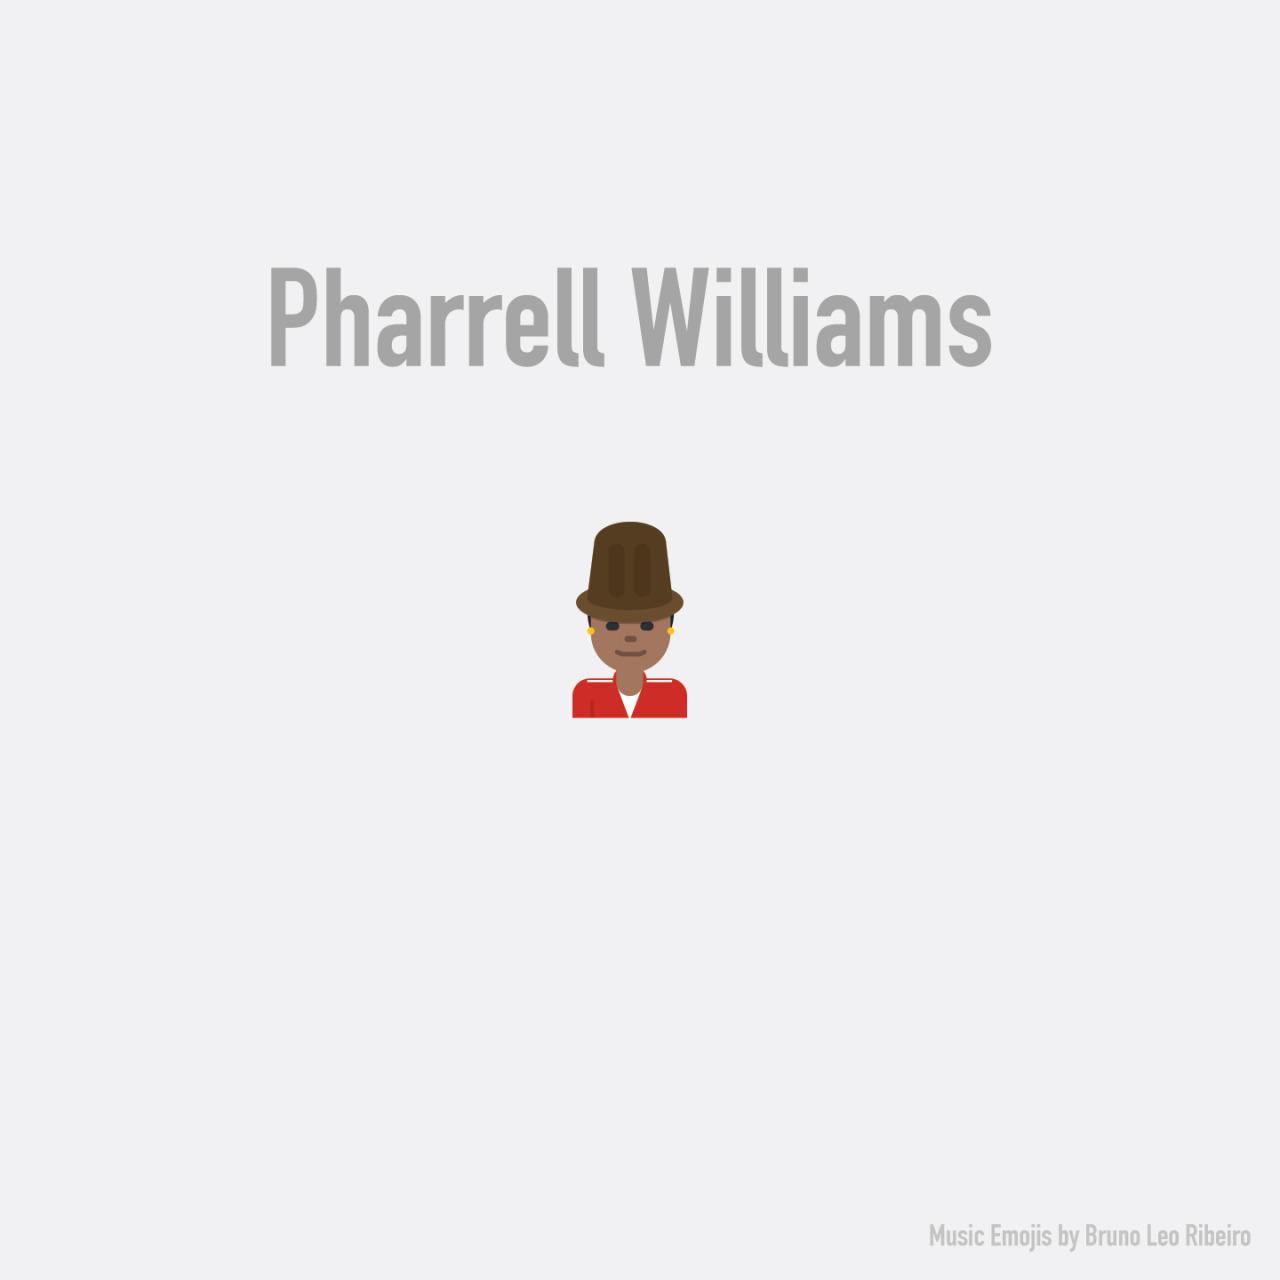 music-emoji3